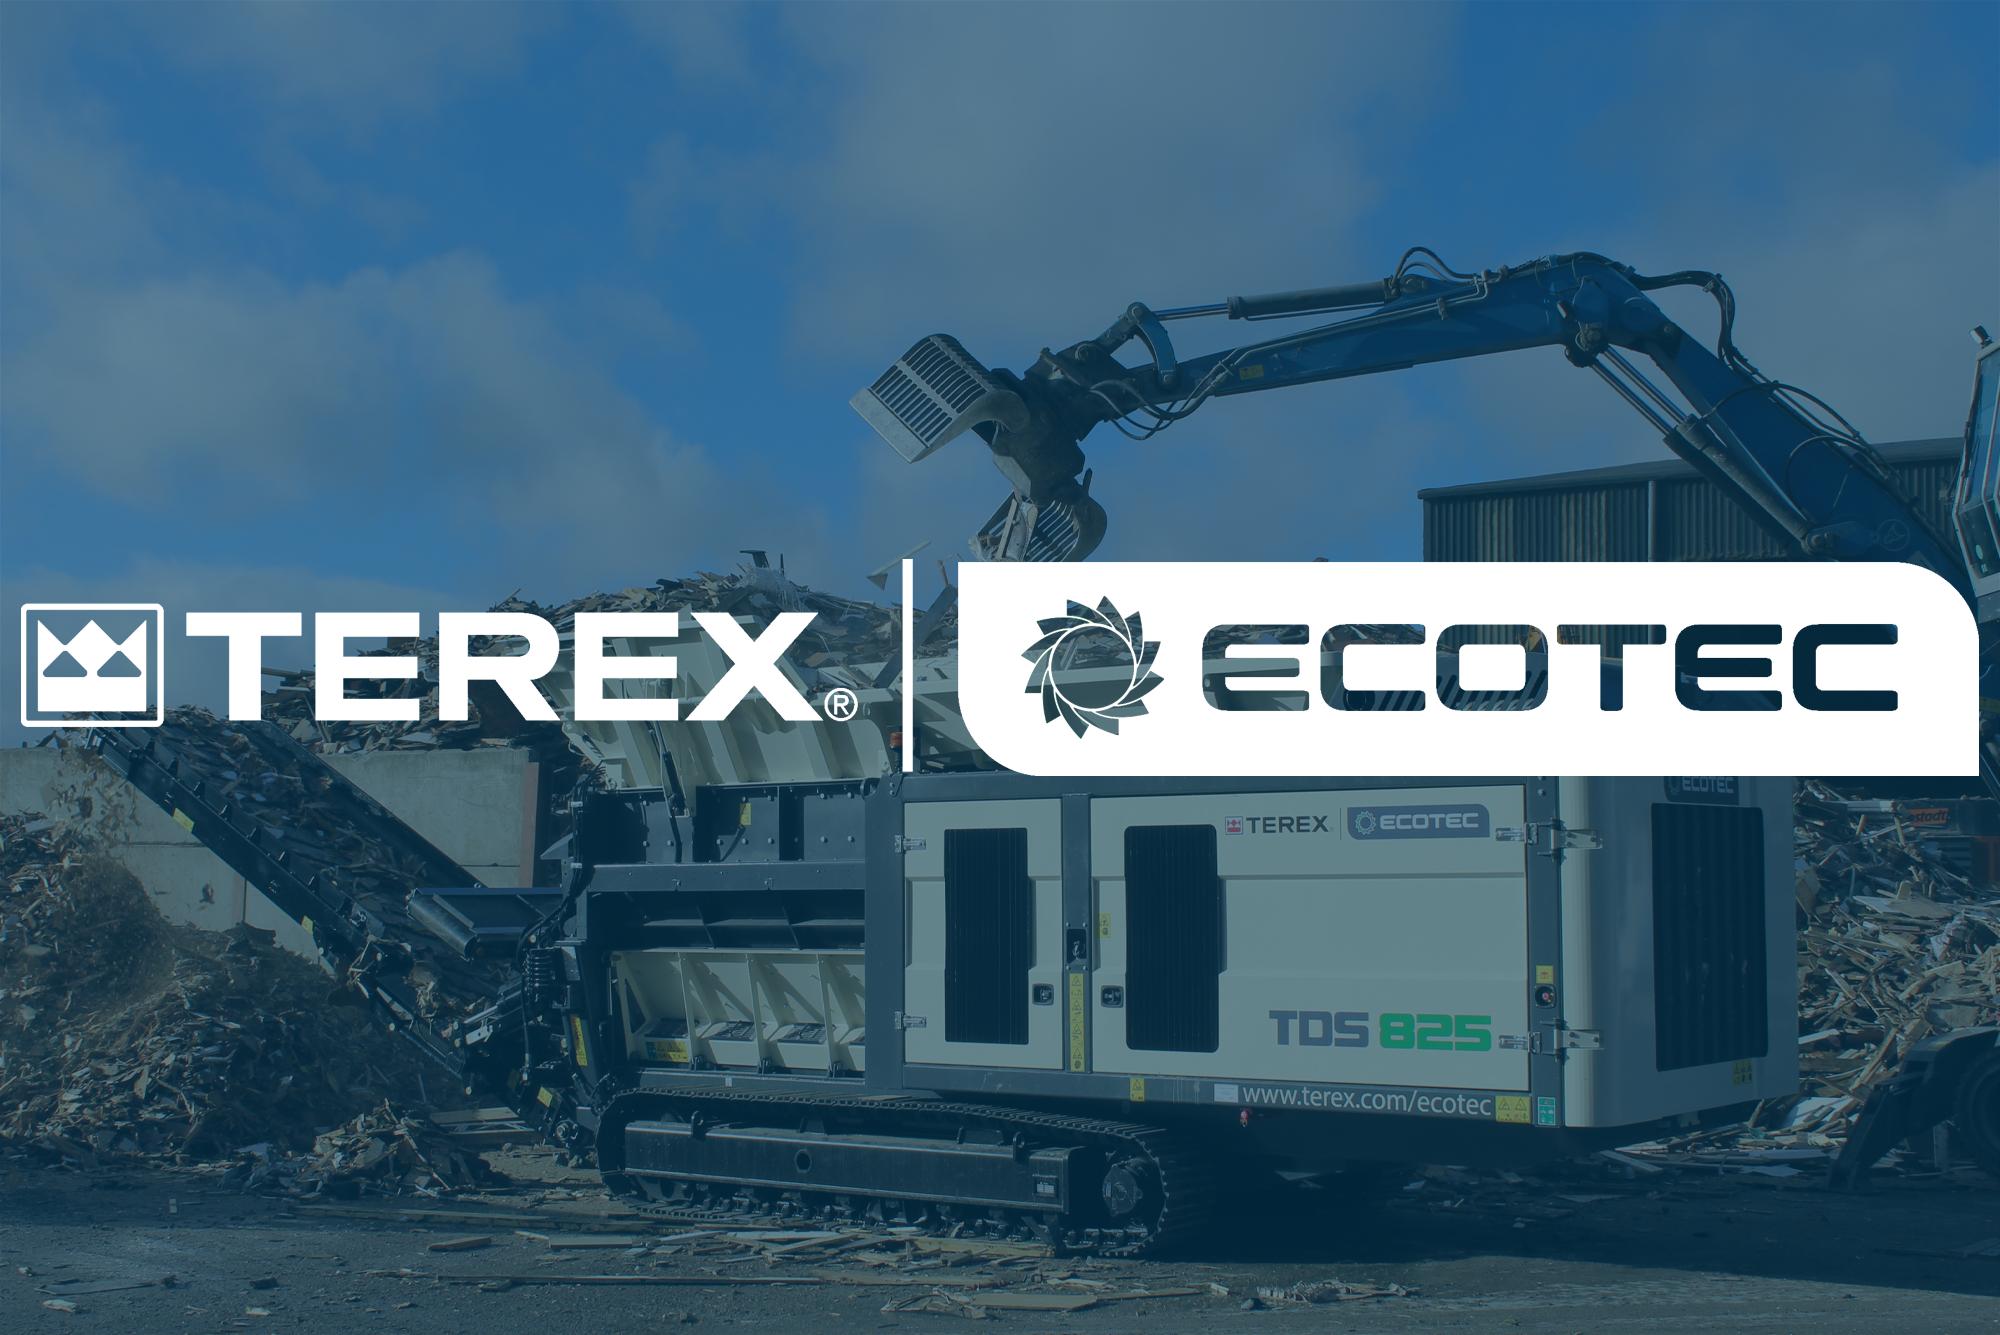 Terex Ecotec marques partenaires cimme